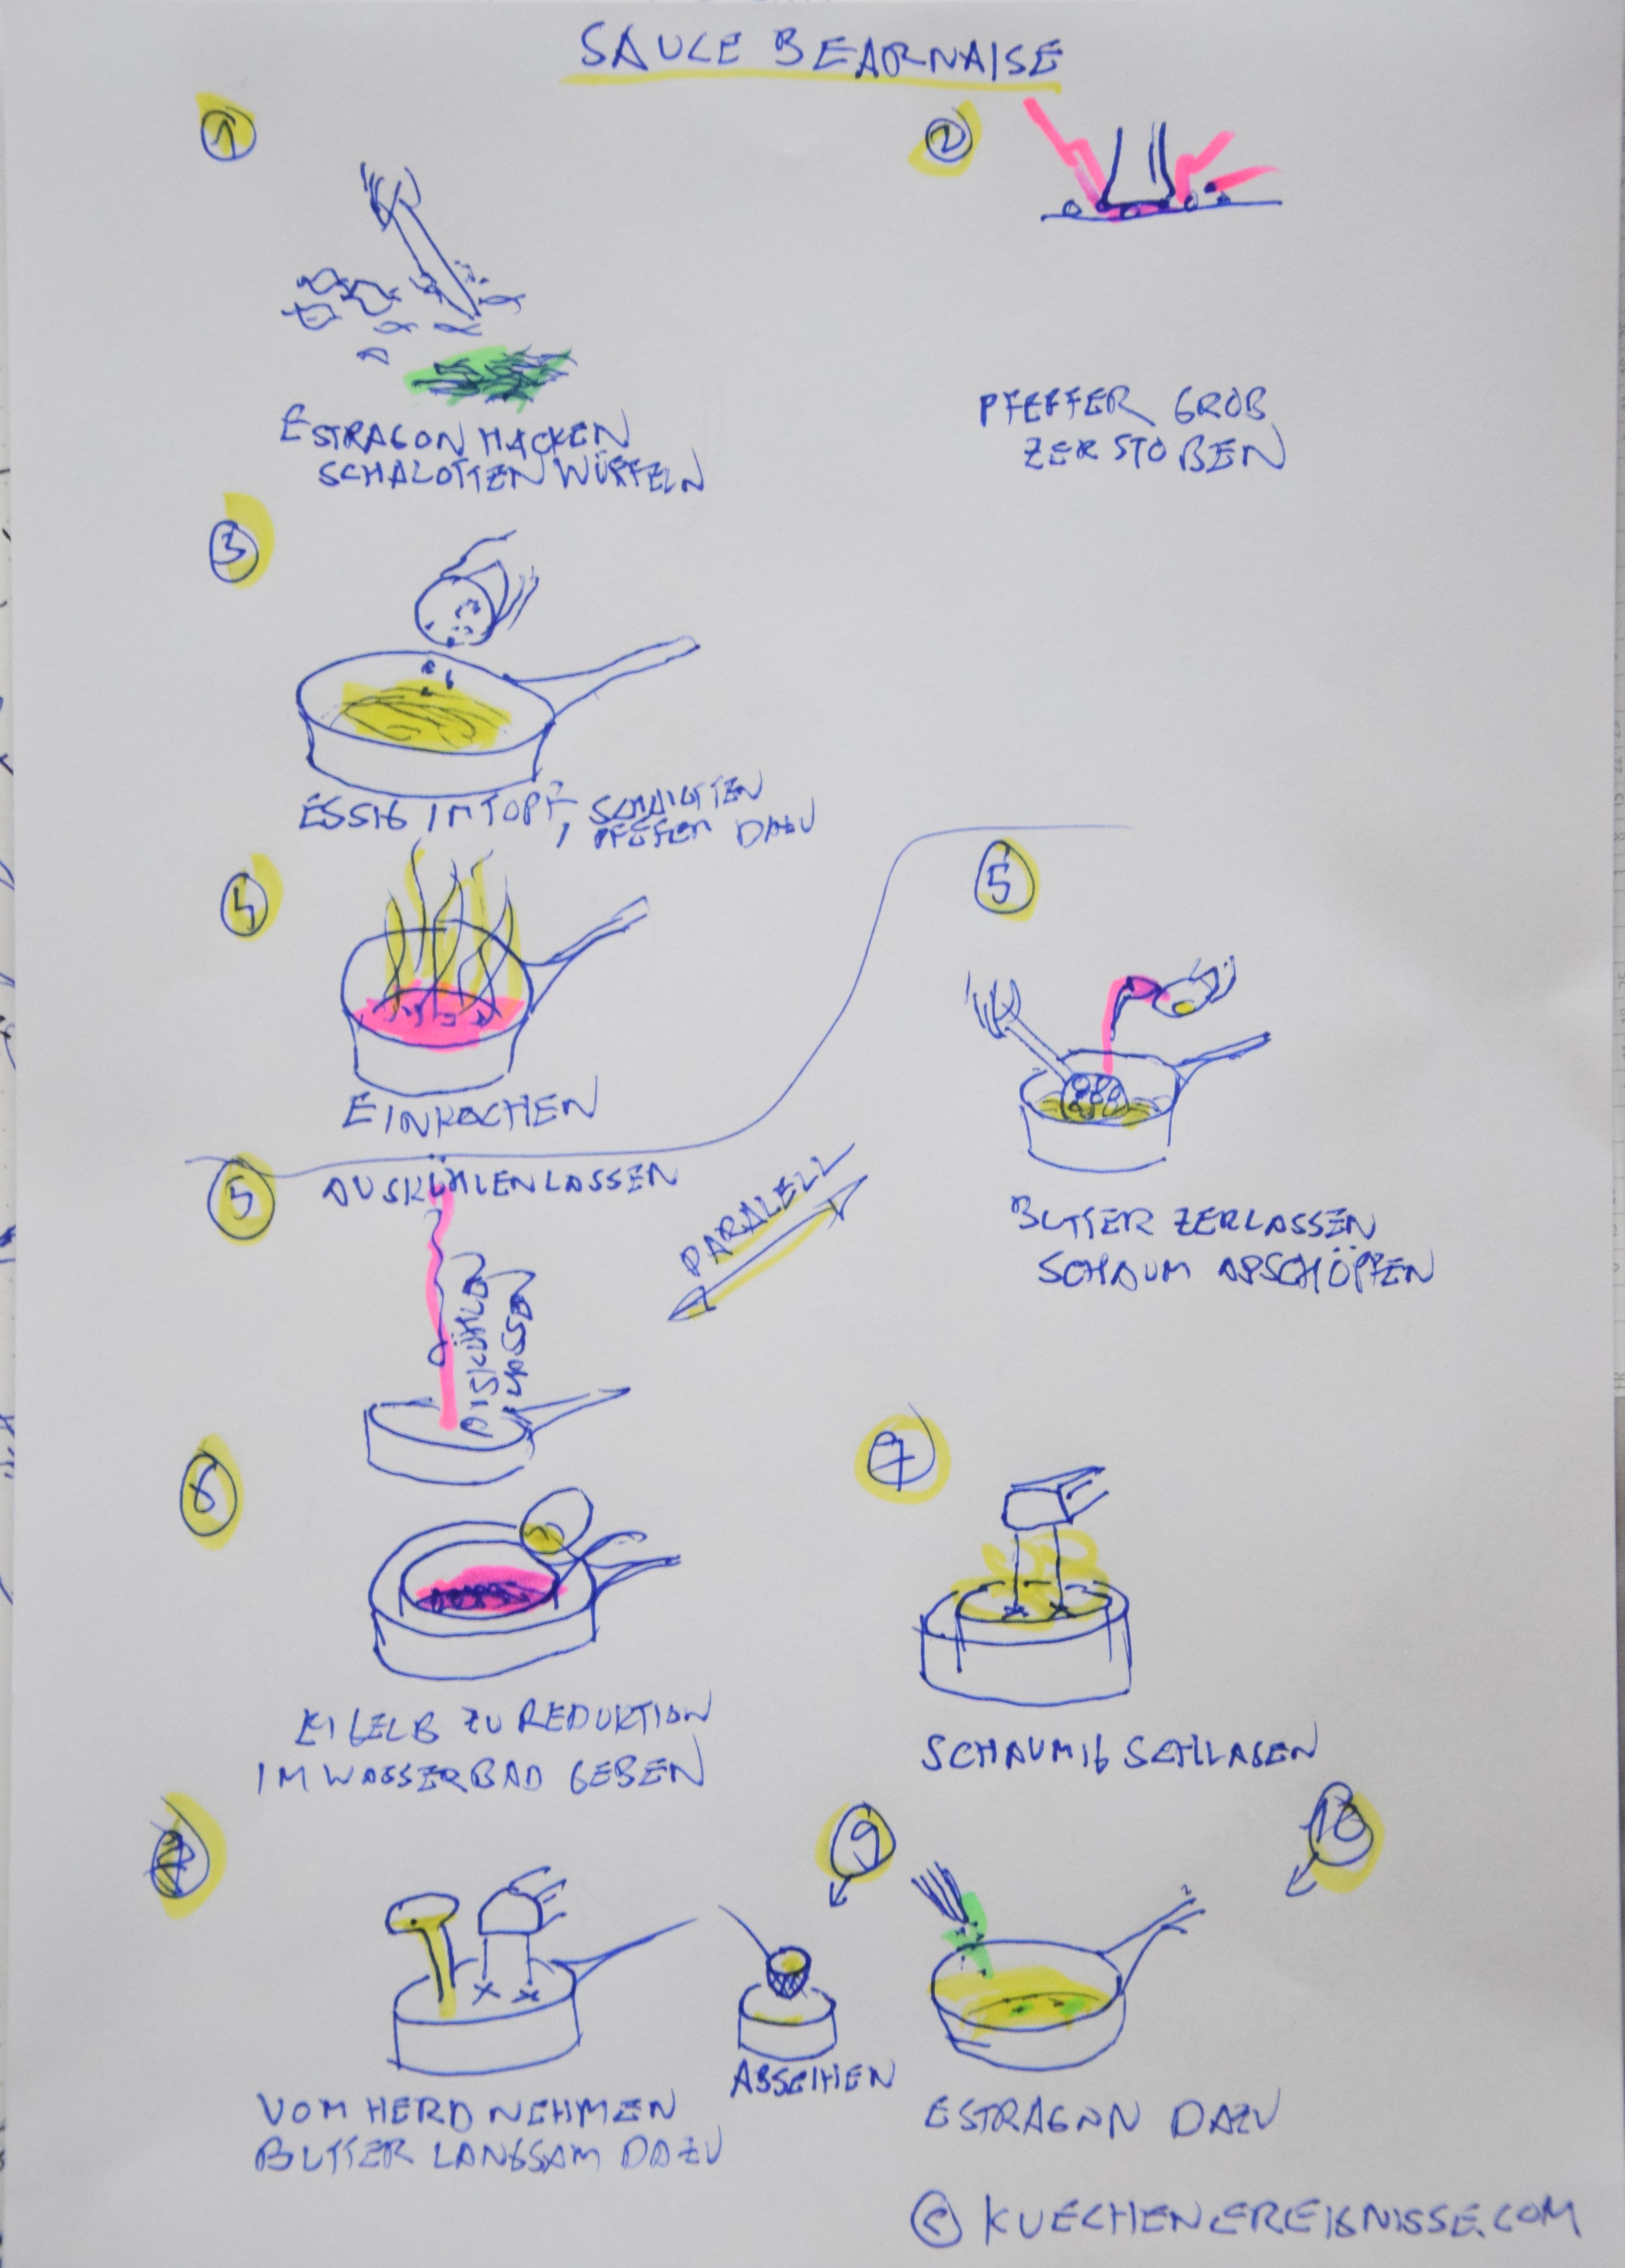 Spargel mit Sauce béarnaise (14).jpg